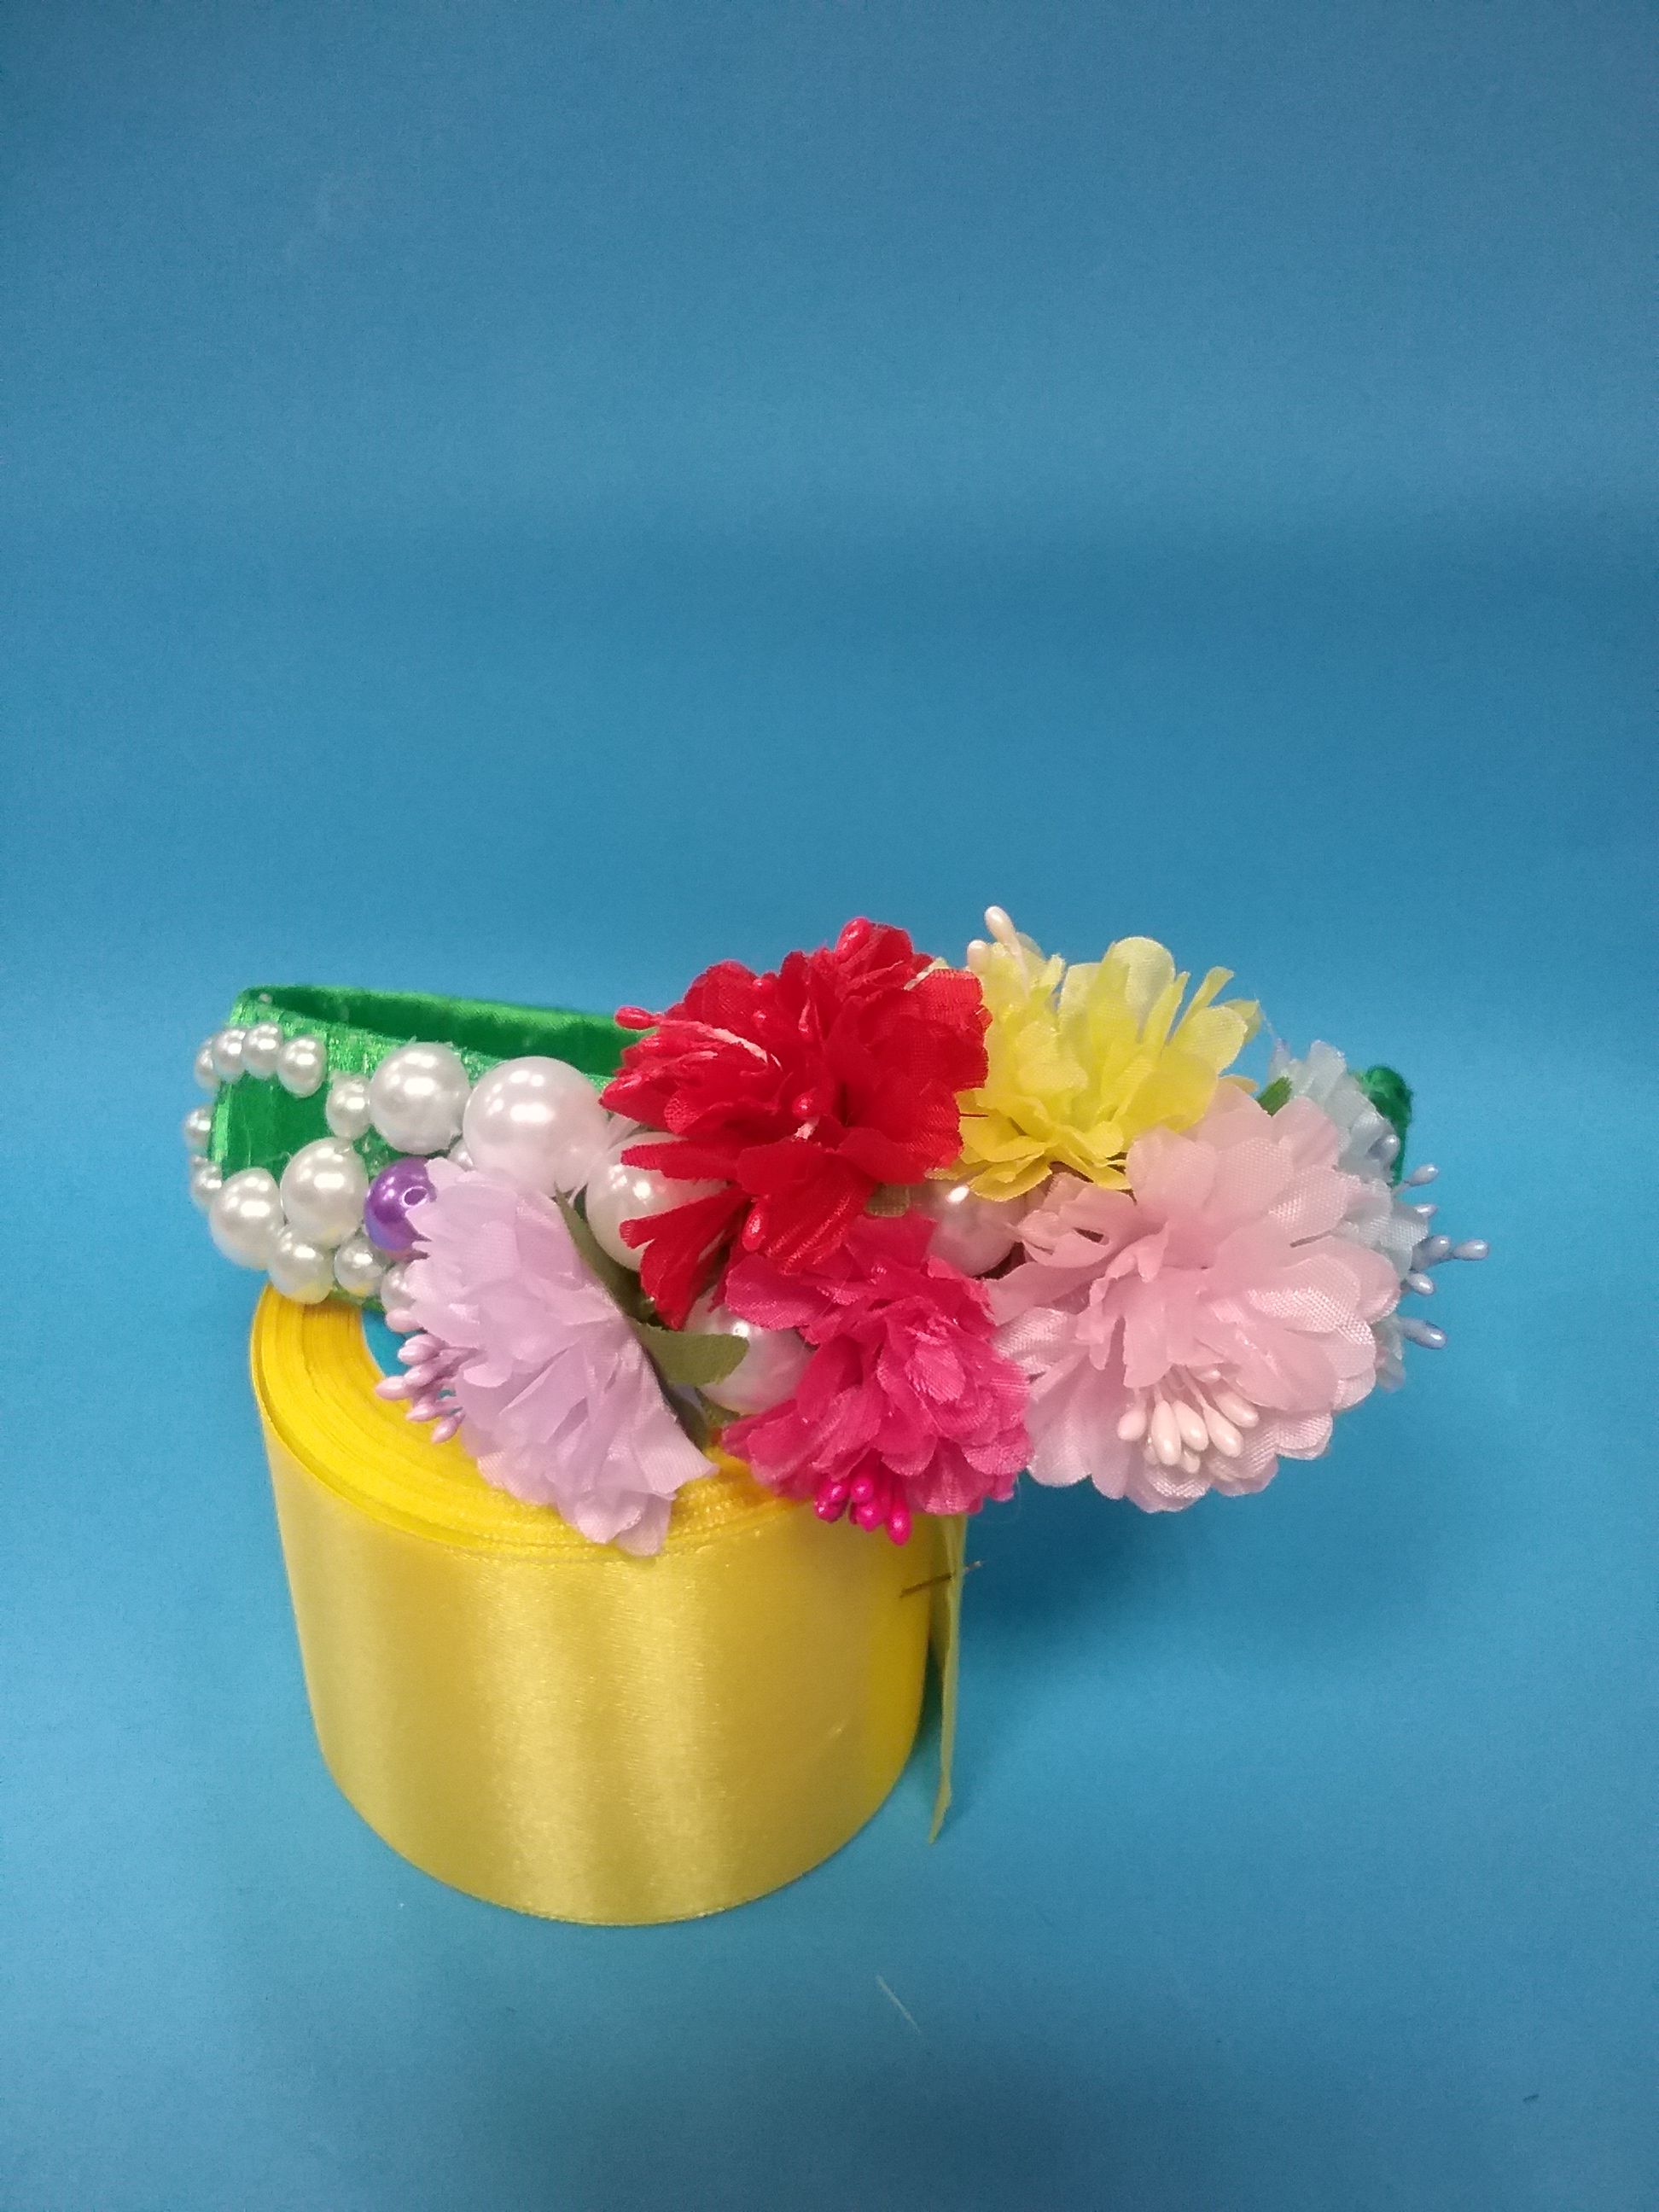 фоамиран фом весна всена канзаши ободки лето заколки цветы